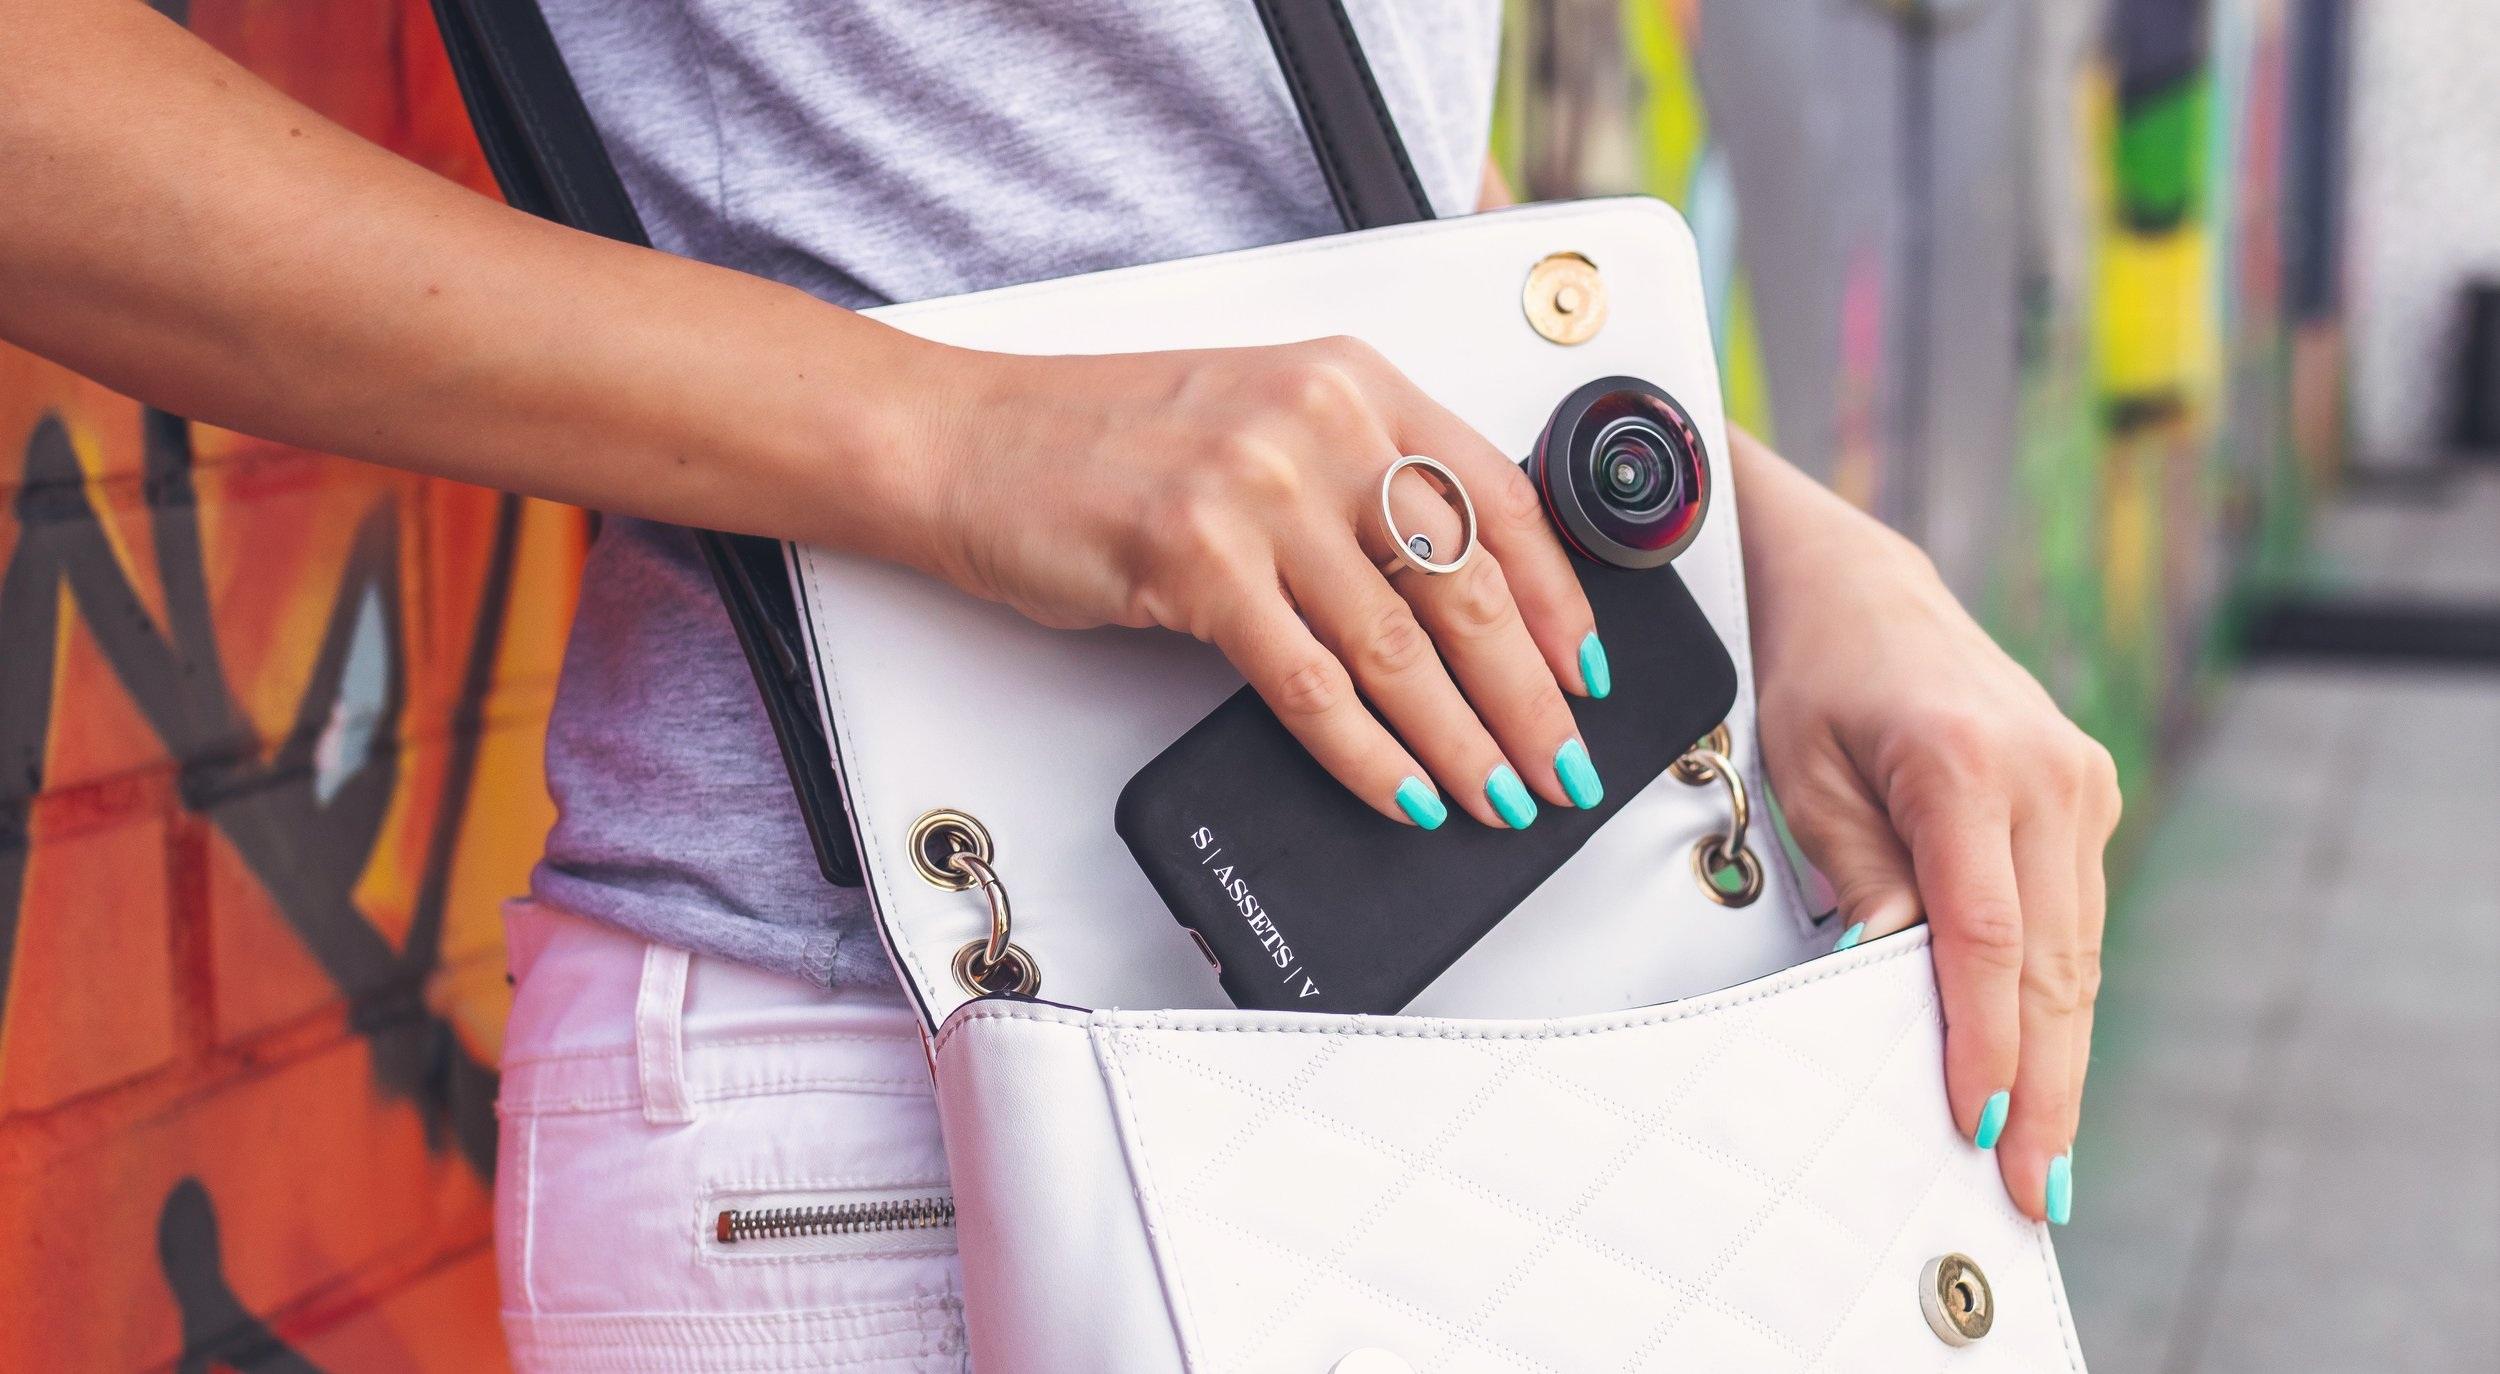 bag-camera-cellphone-2559787.jpg